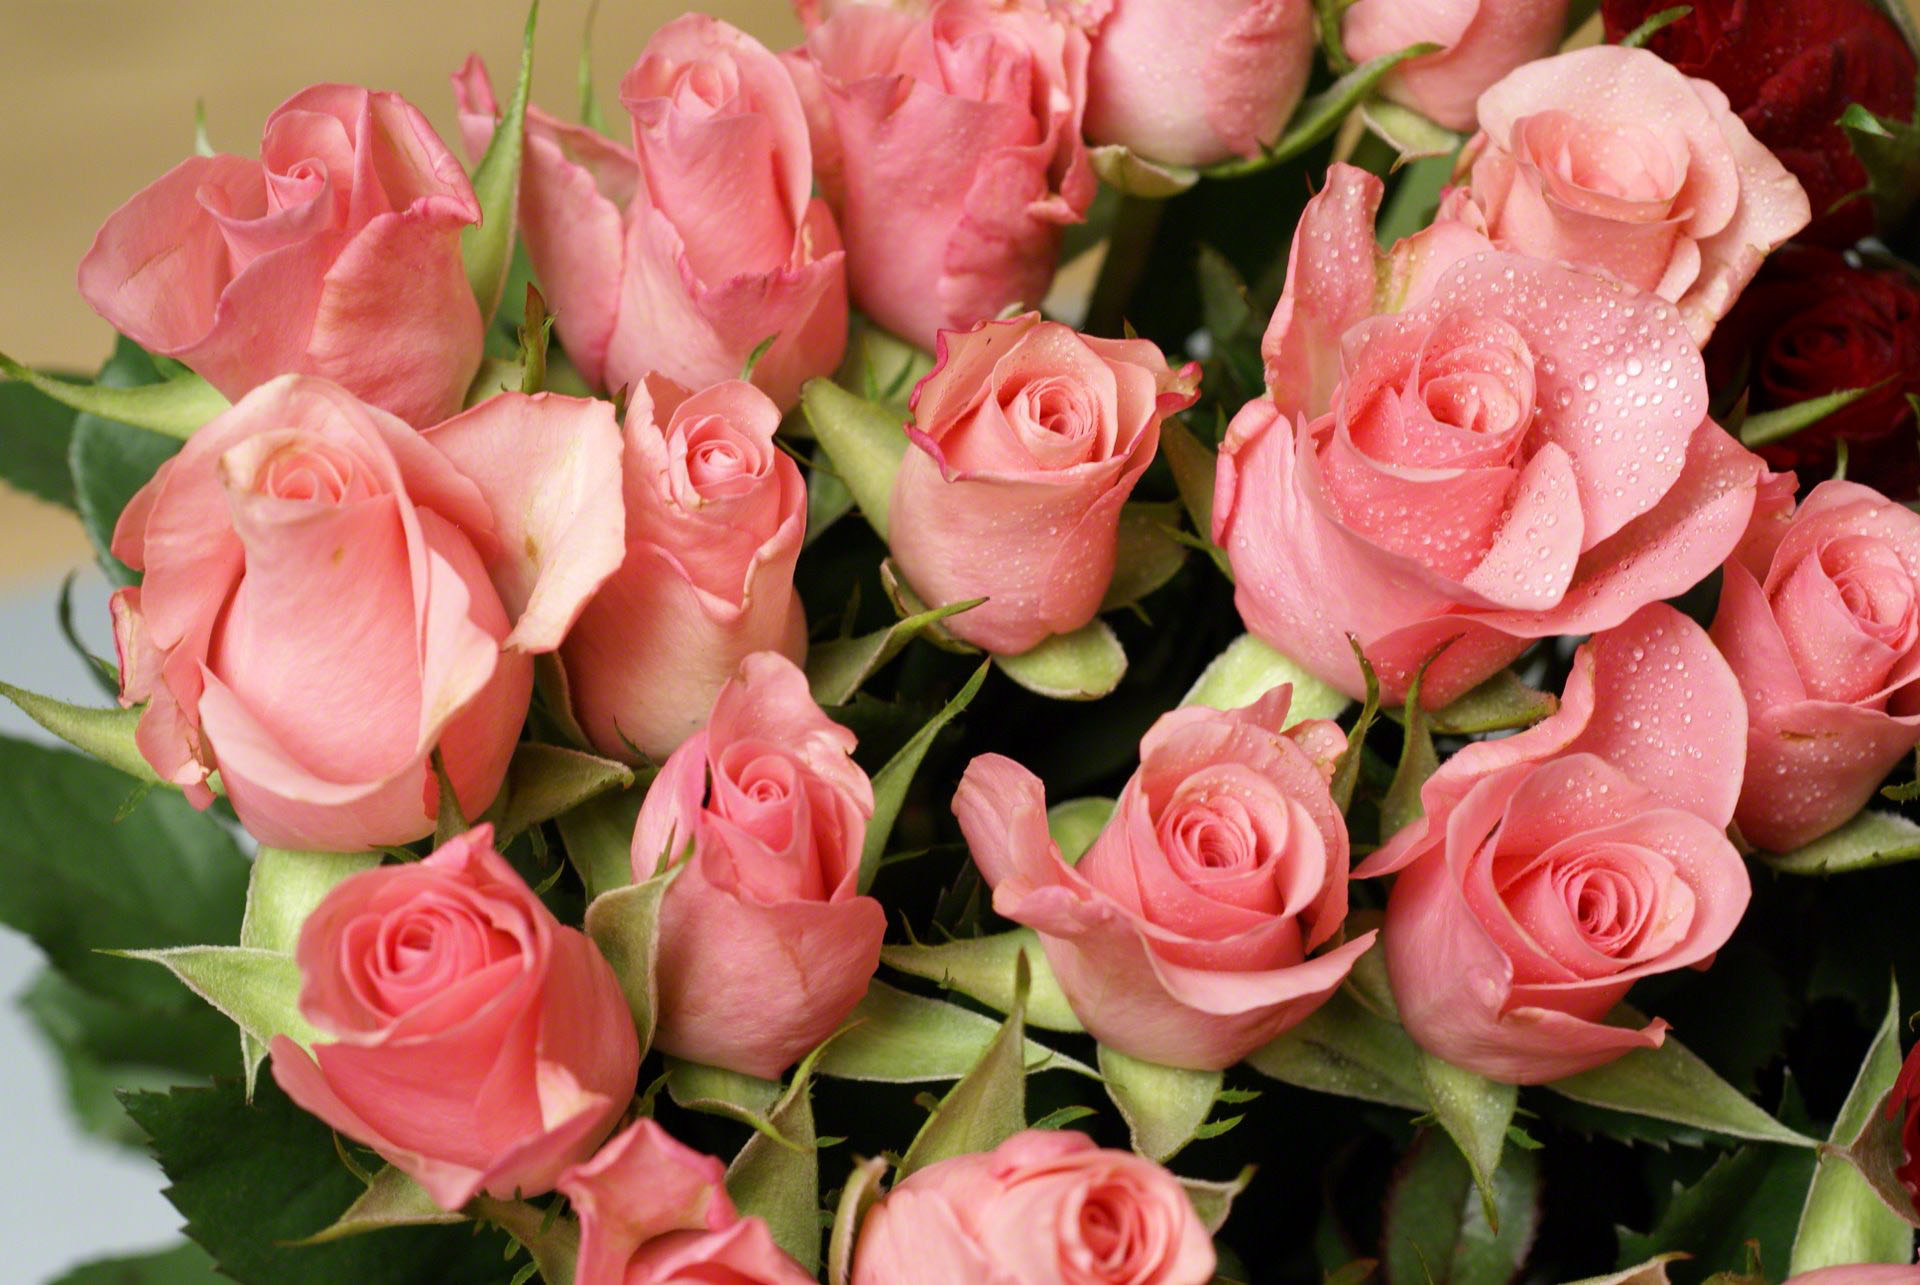 http://www.fabiovisentin.com/photography/photo/12/mini-pink-roses-01608.jpg